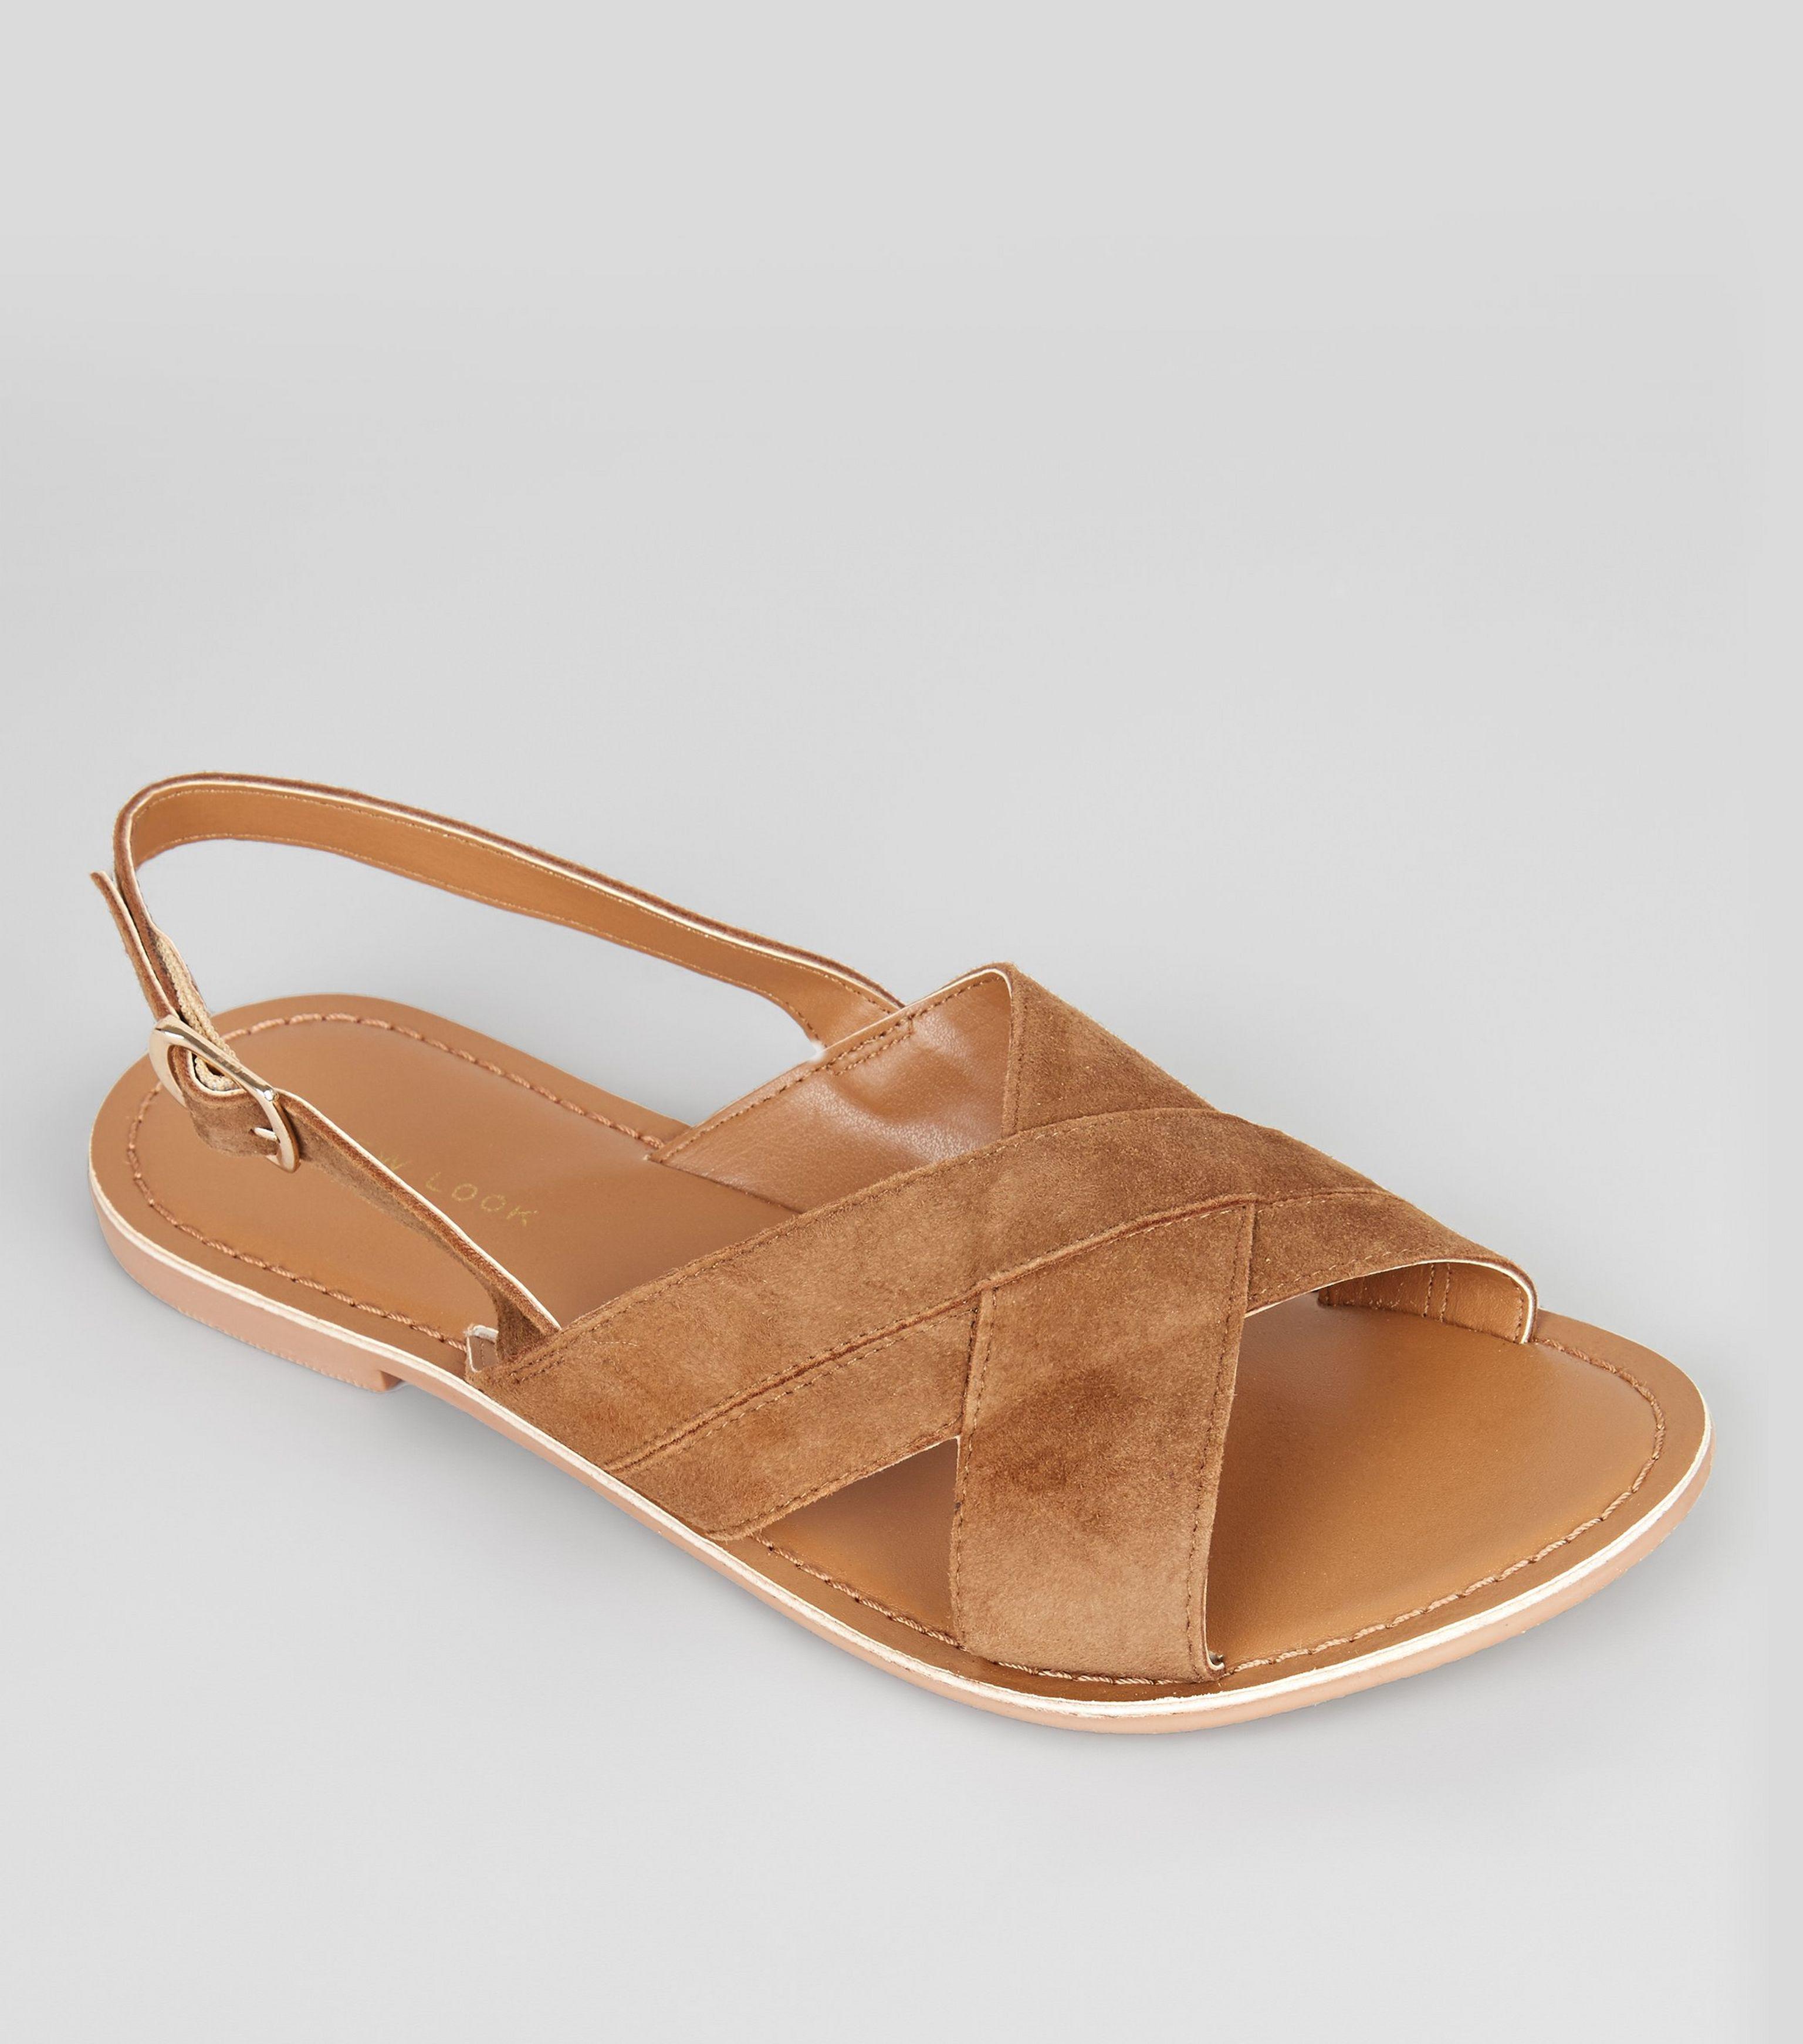 8e9e91e30c0c New Look Tan Suede Cross Strap Sandals in Brown - Lyst